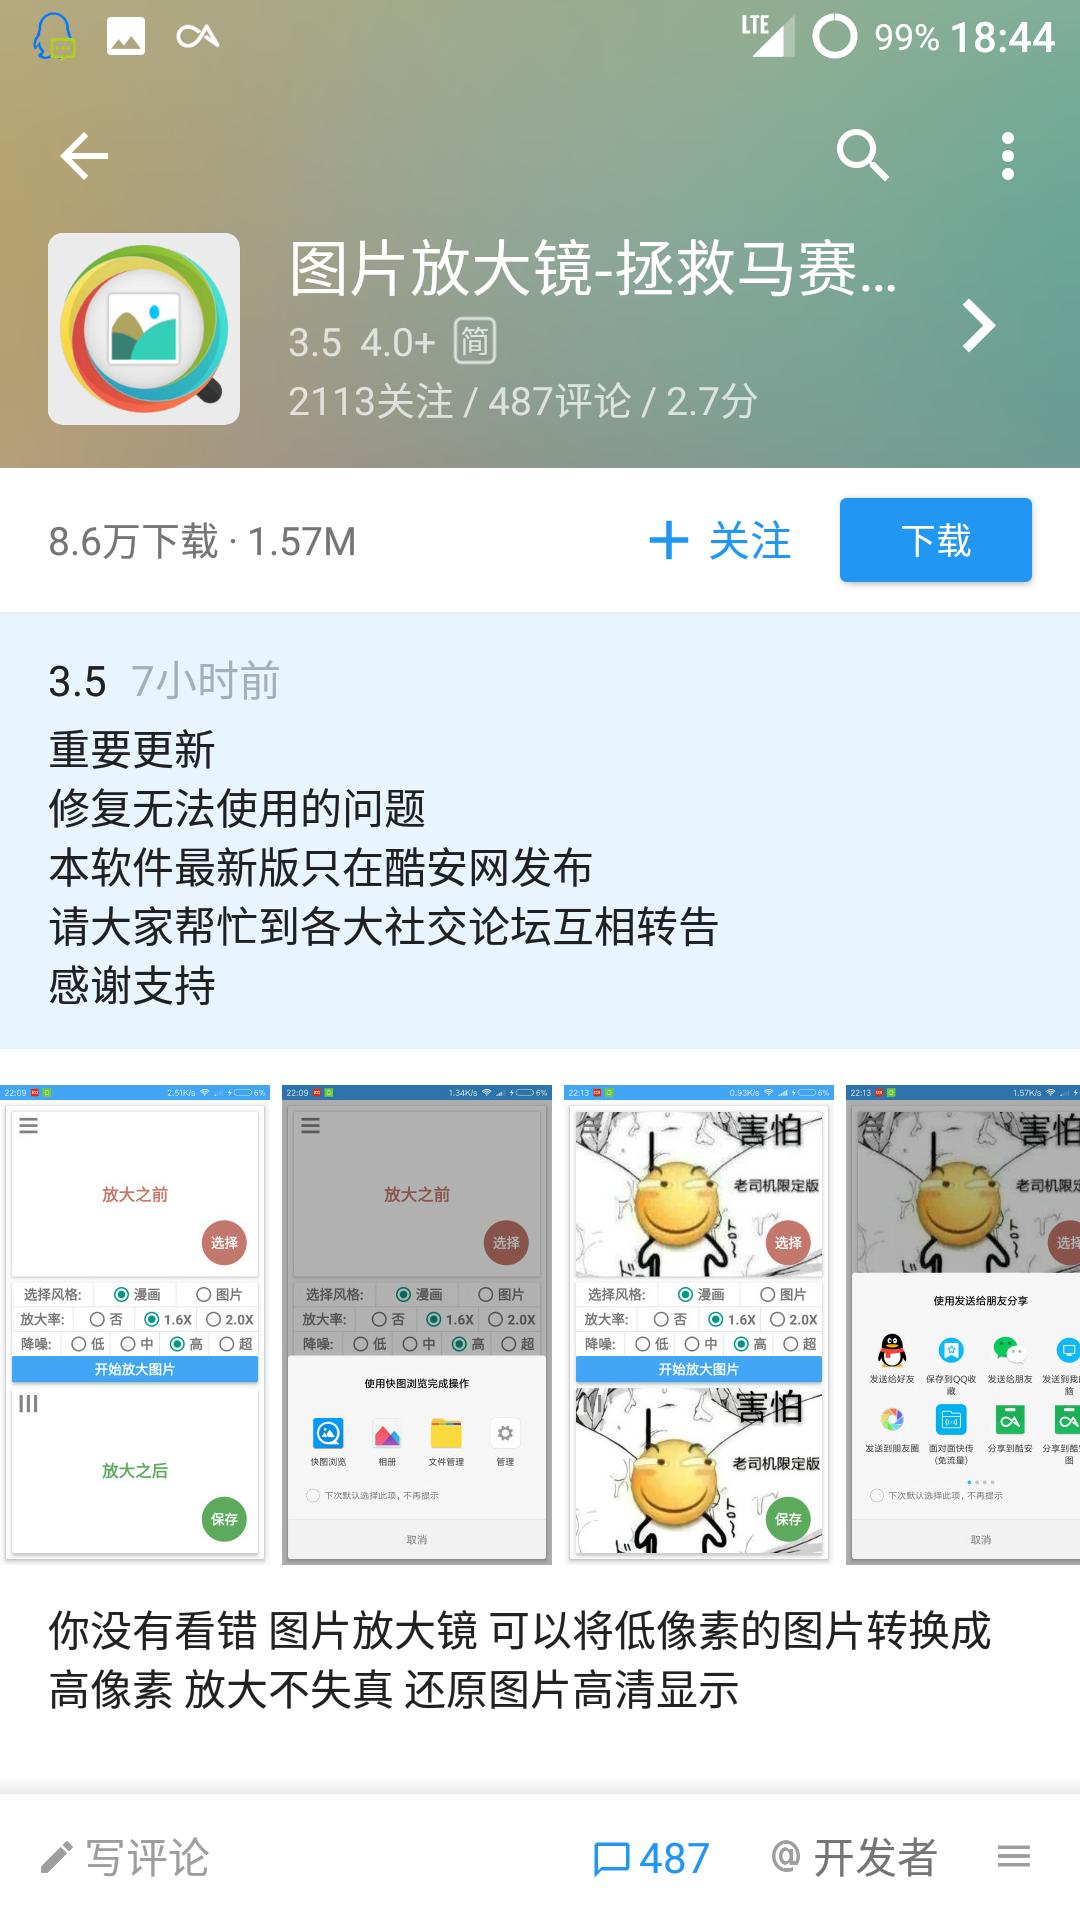 screenshot_20170728-184445